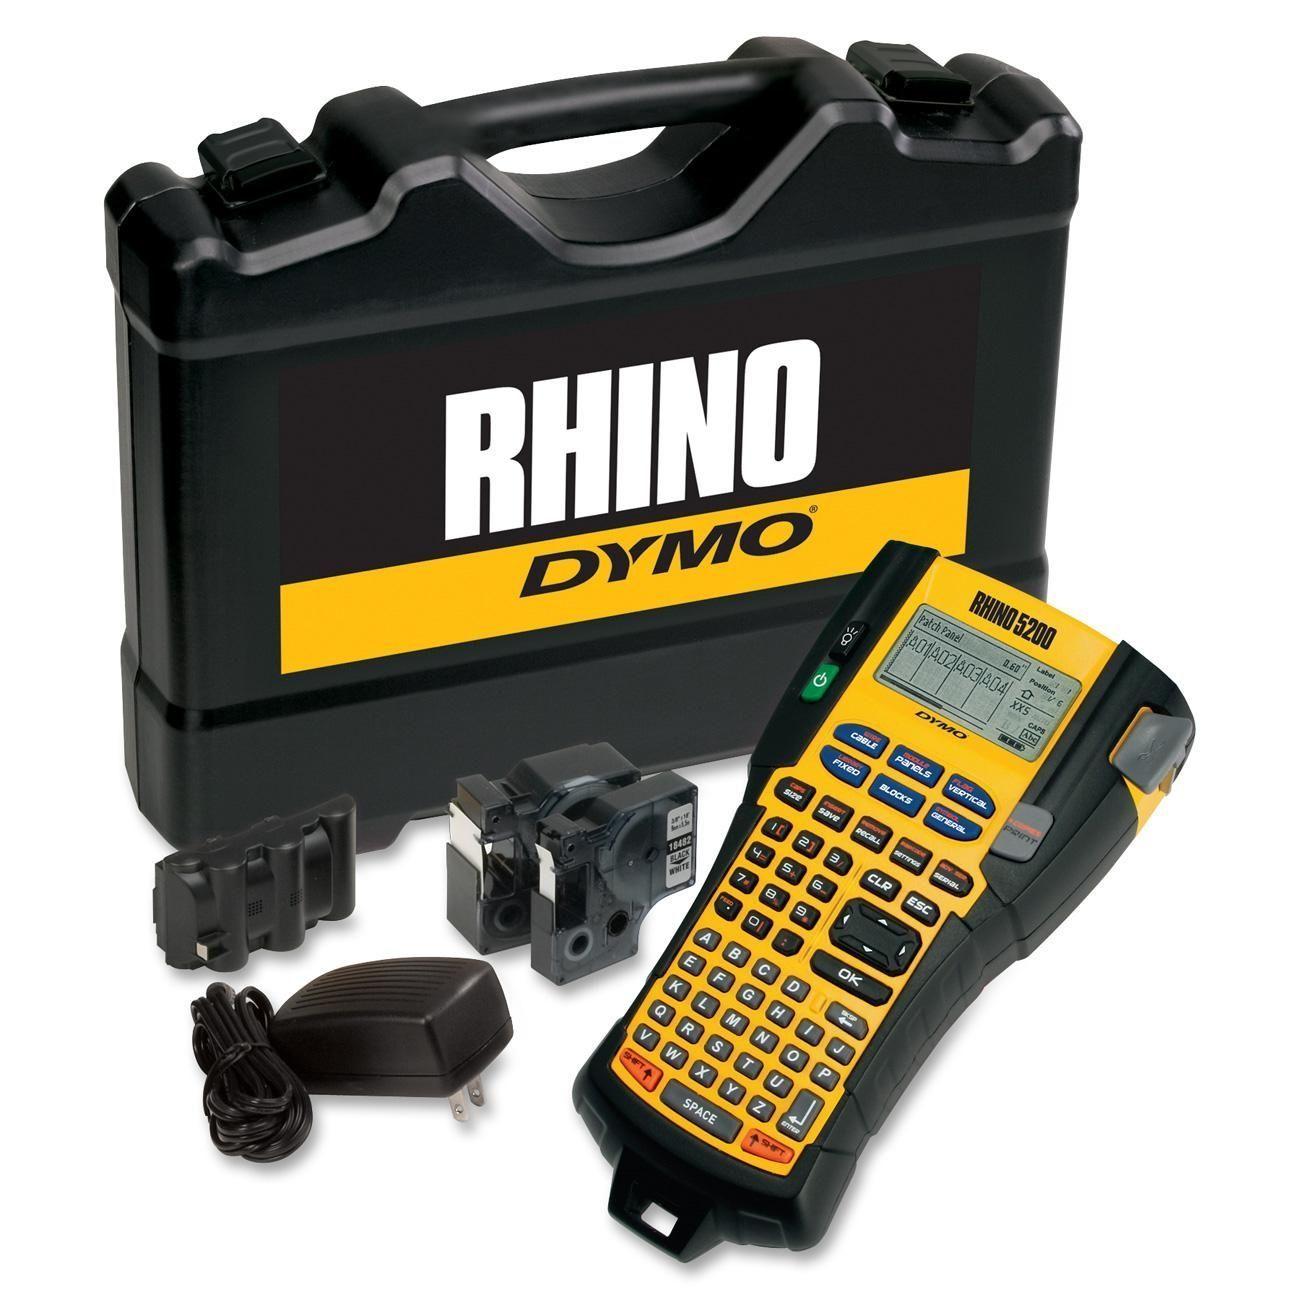 Dymo Rhino 5200 Label Maker Kit, Yellow Portable printer